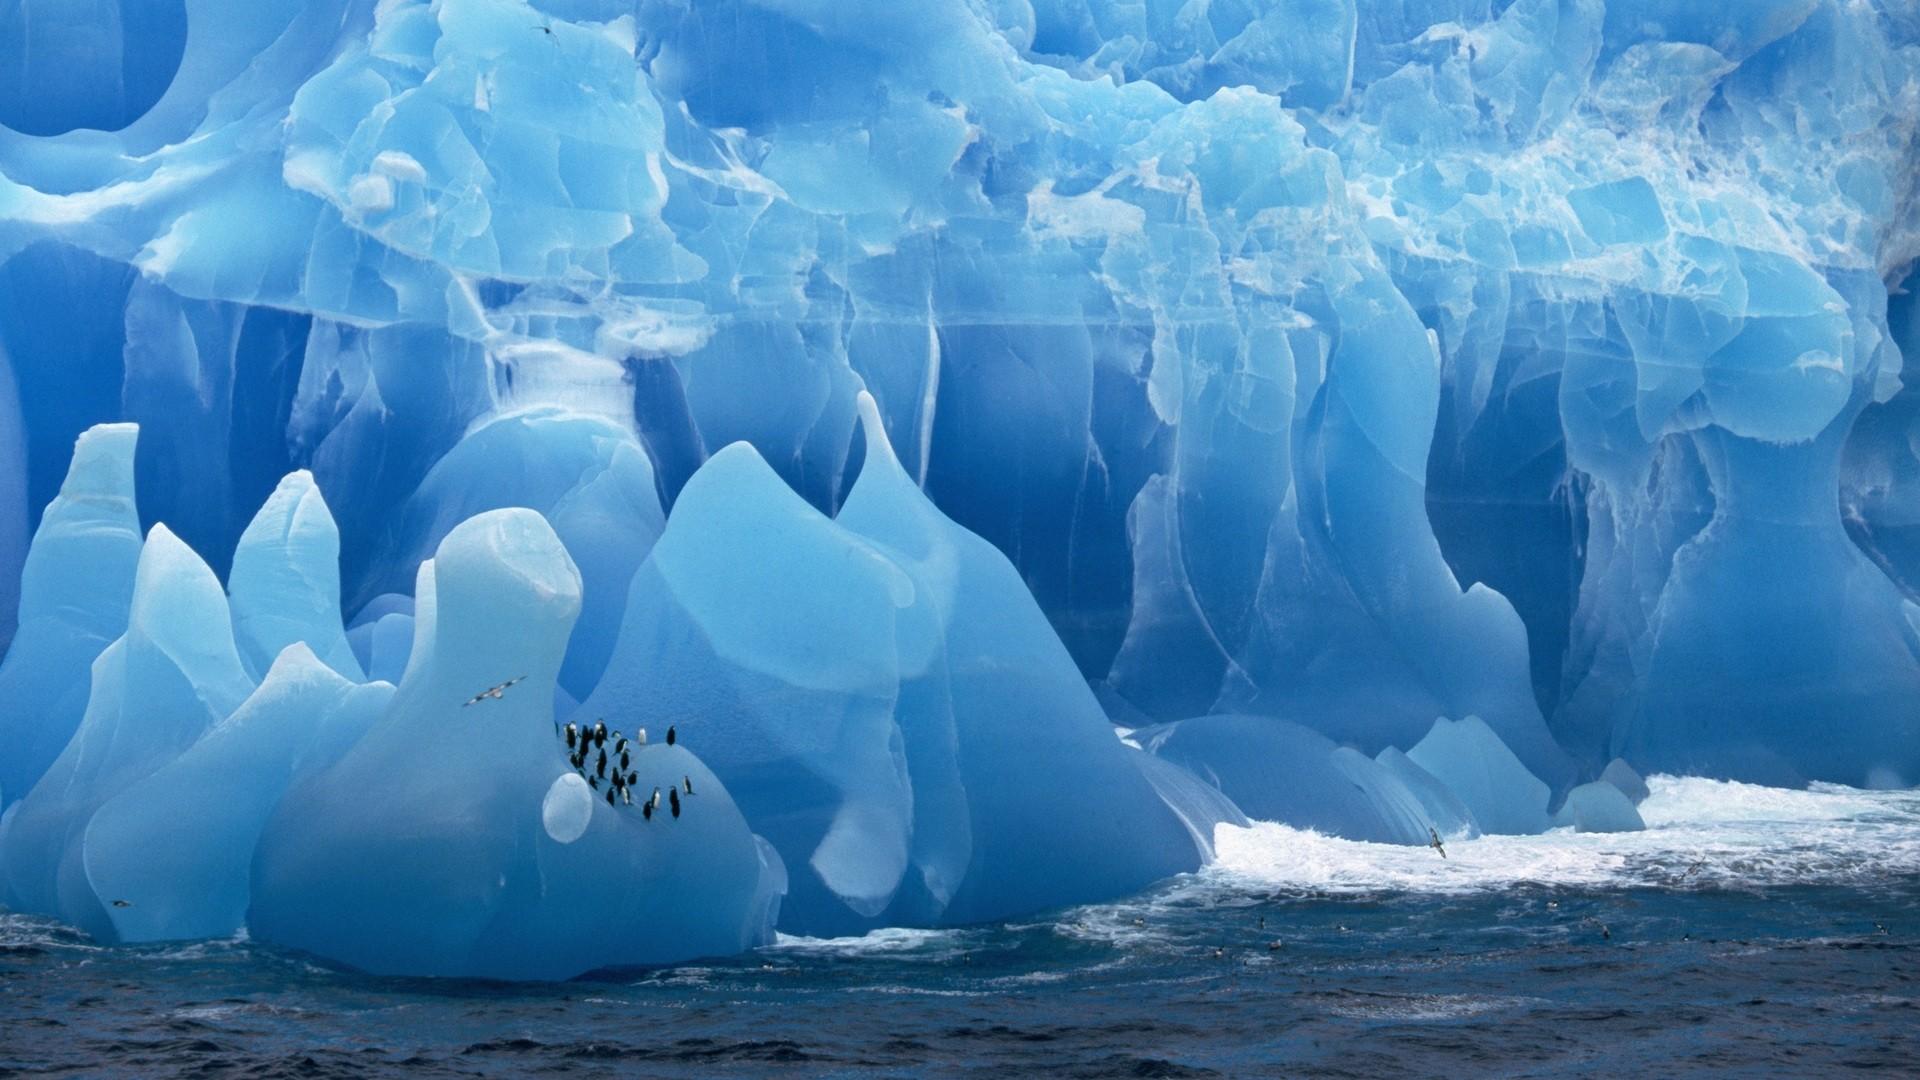 Iceberg Wallpaper image hd